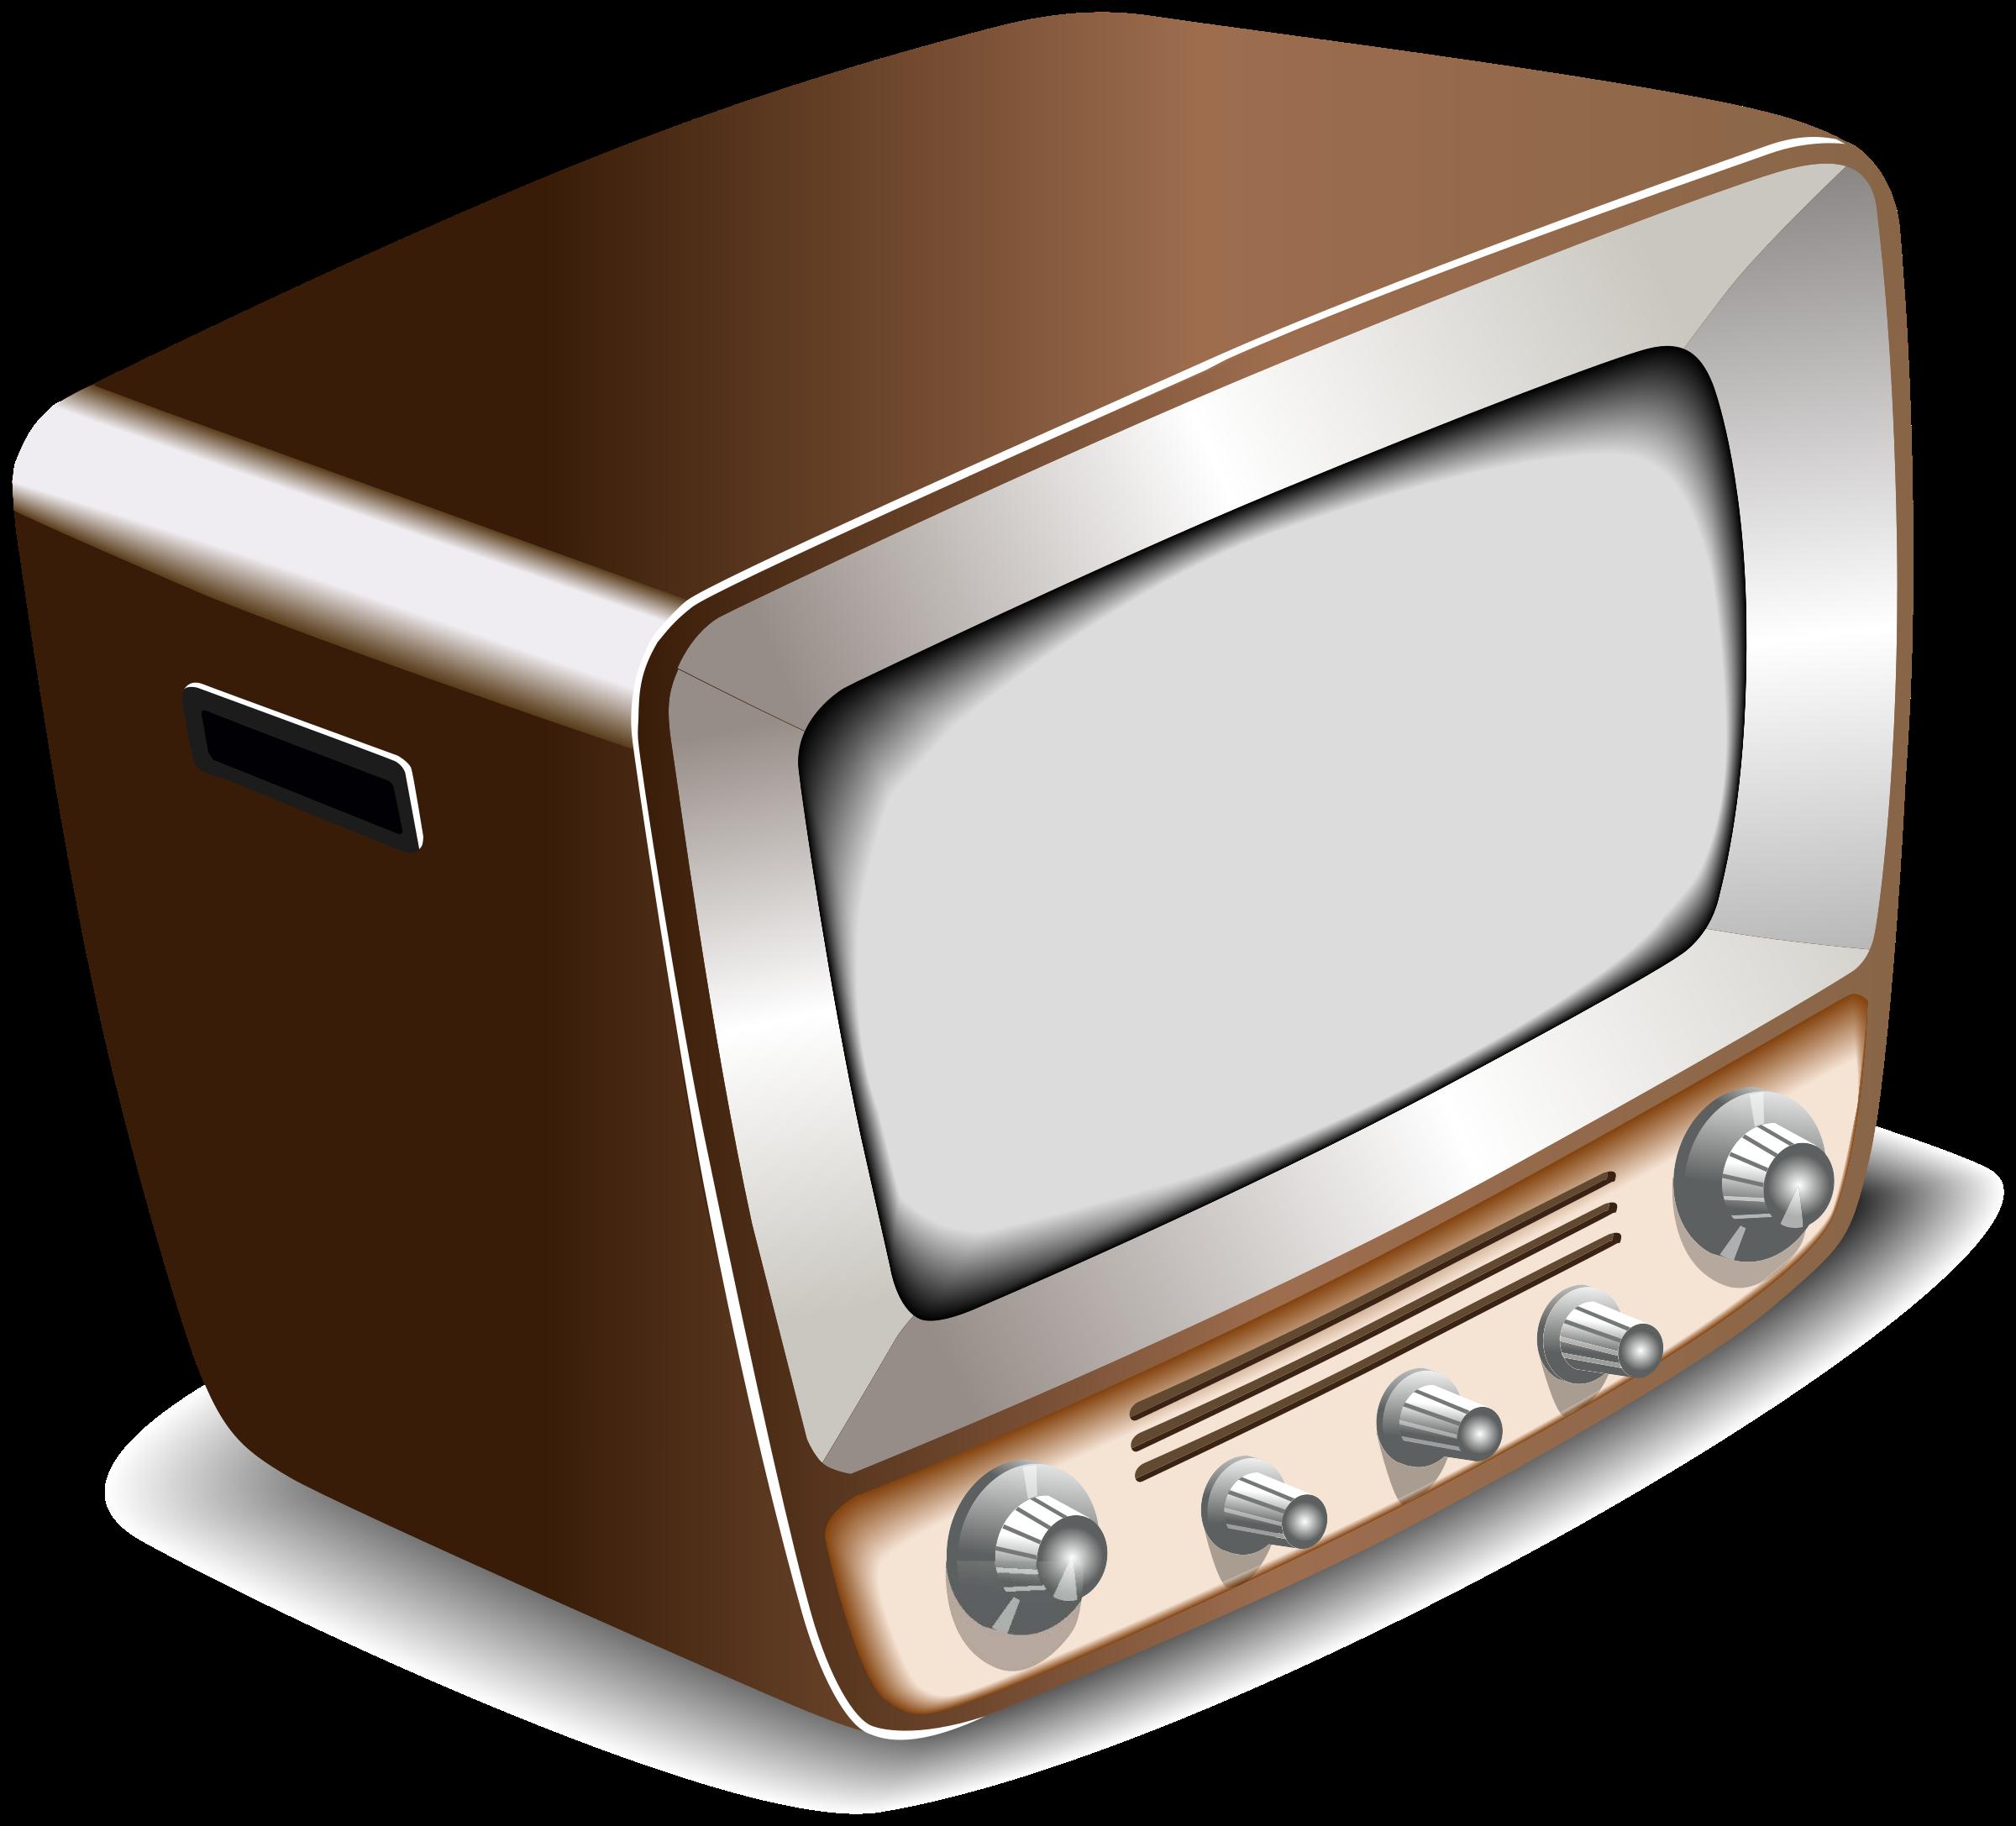 Tv cartoon image old school pic